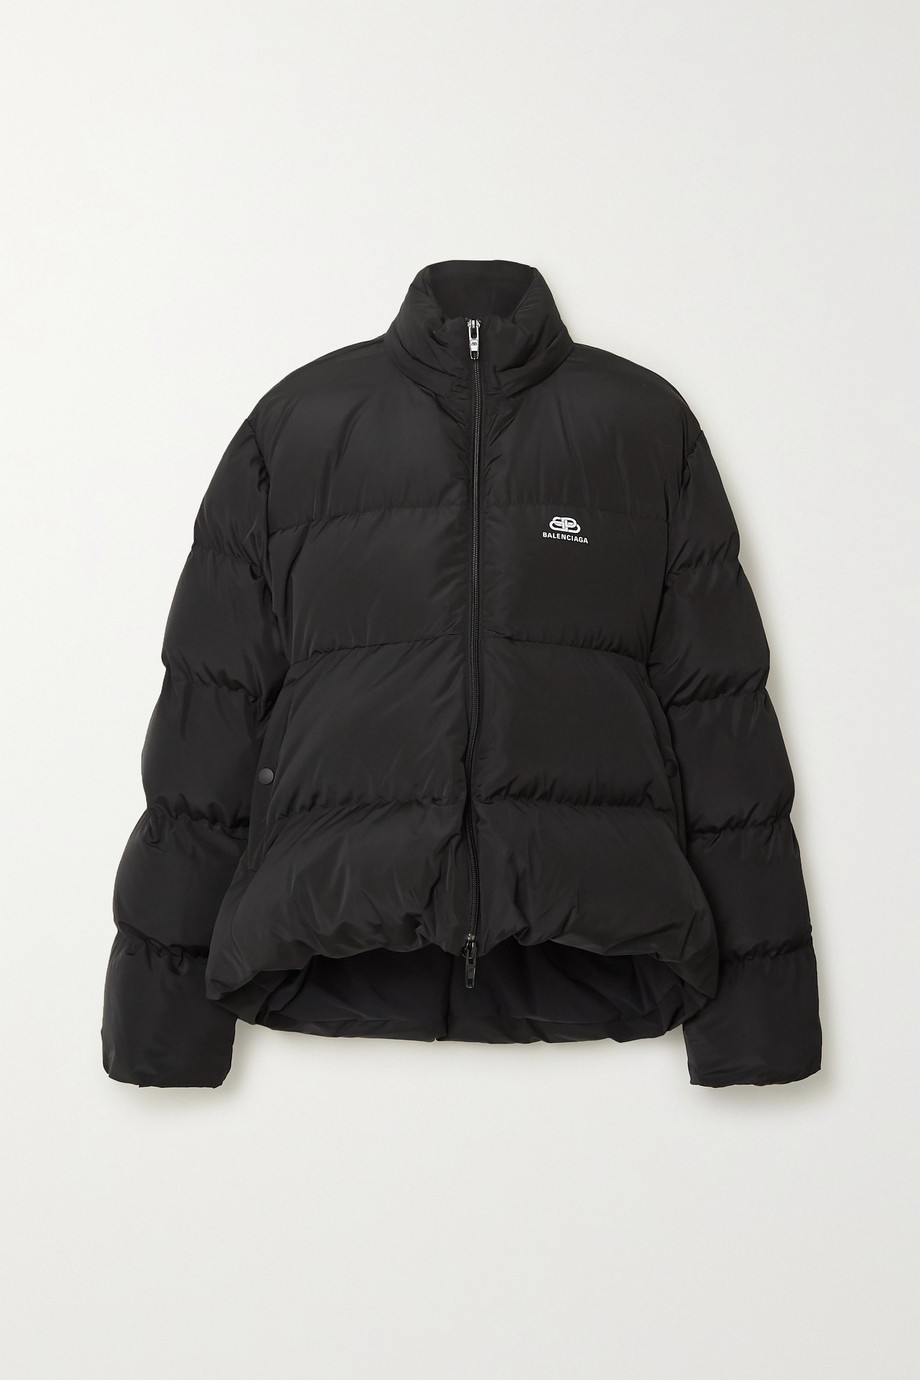 Balenciaga C-Shape oversized hooded quilted shell jacket